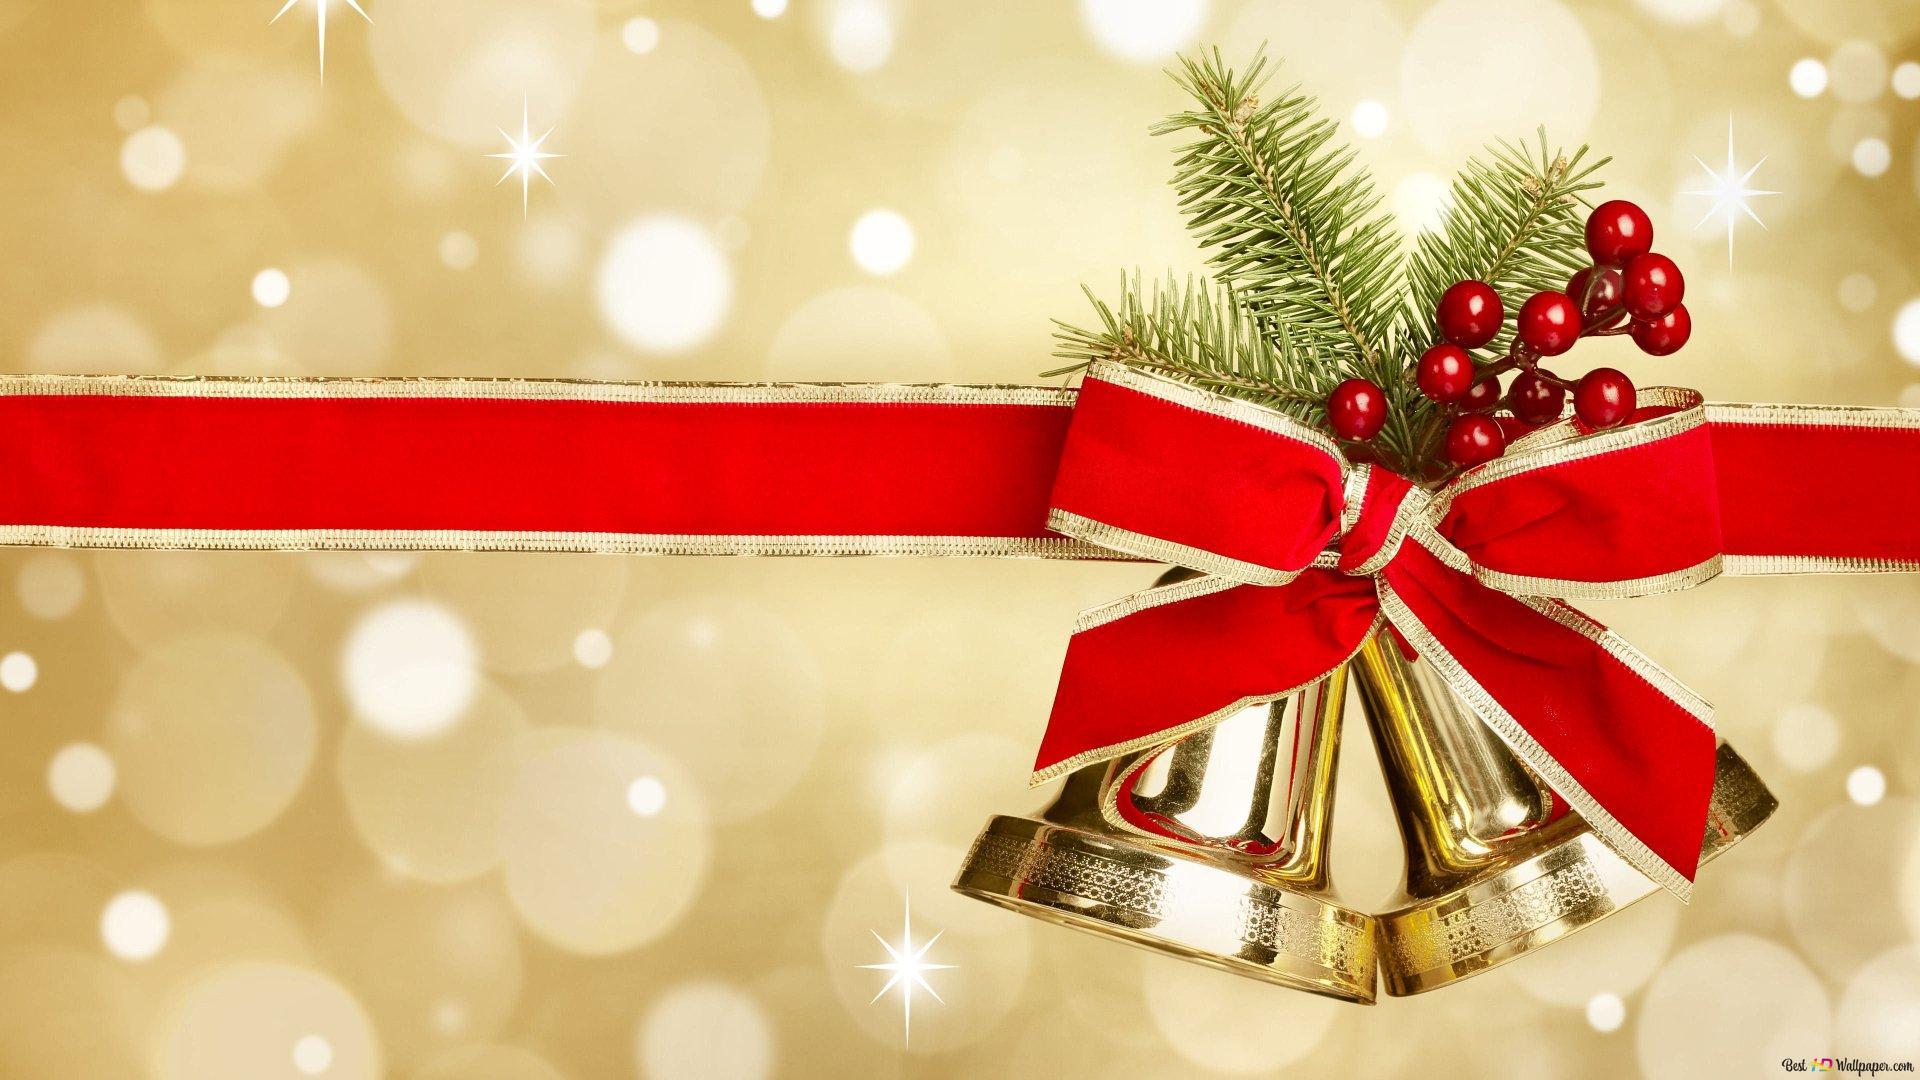 Christmas Bells And Mistletoe Hd Wallpaper Download